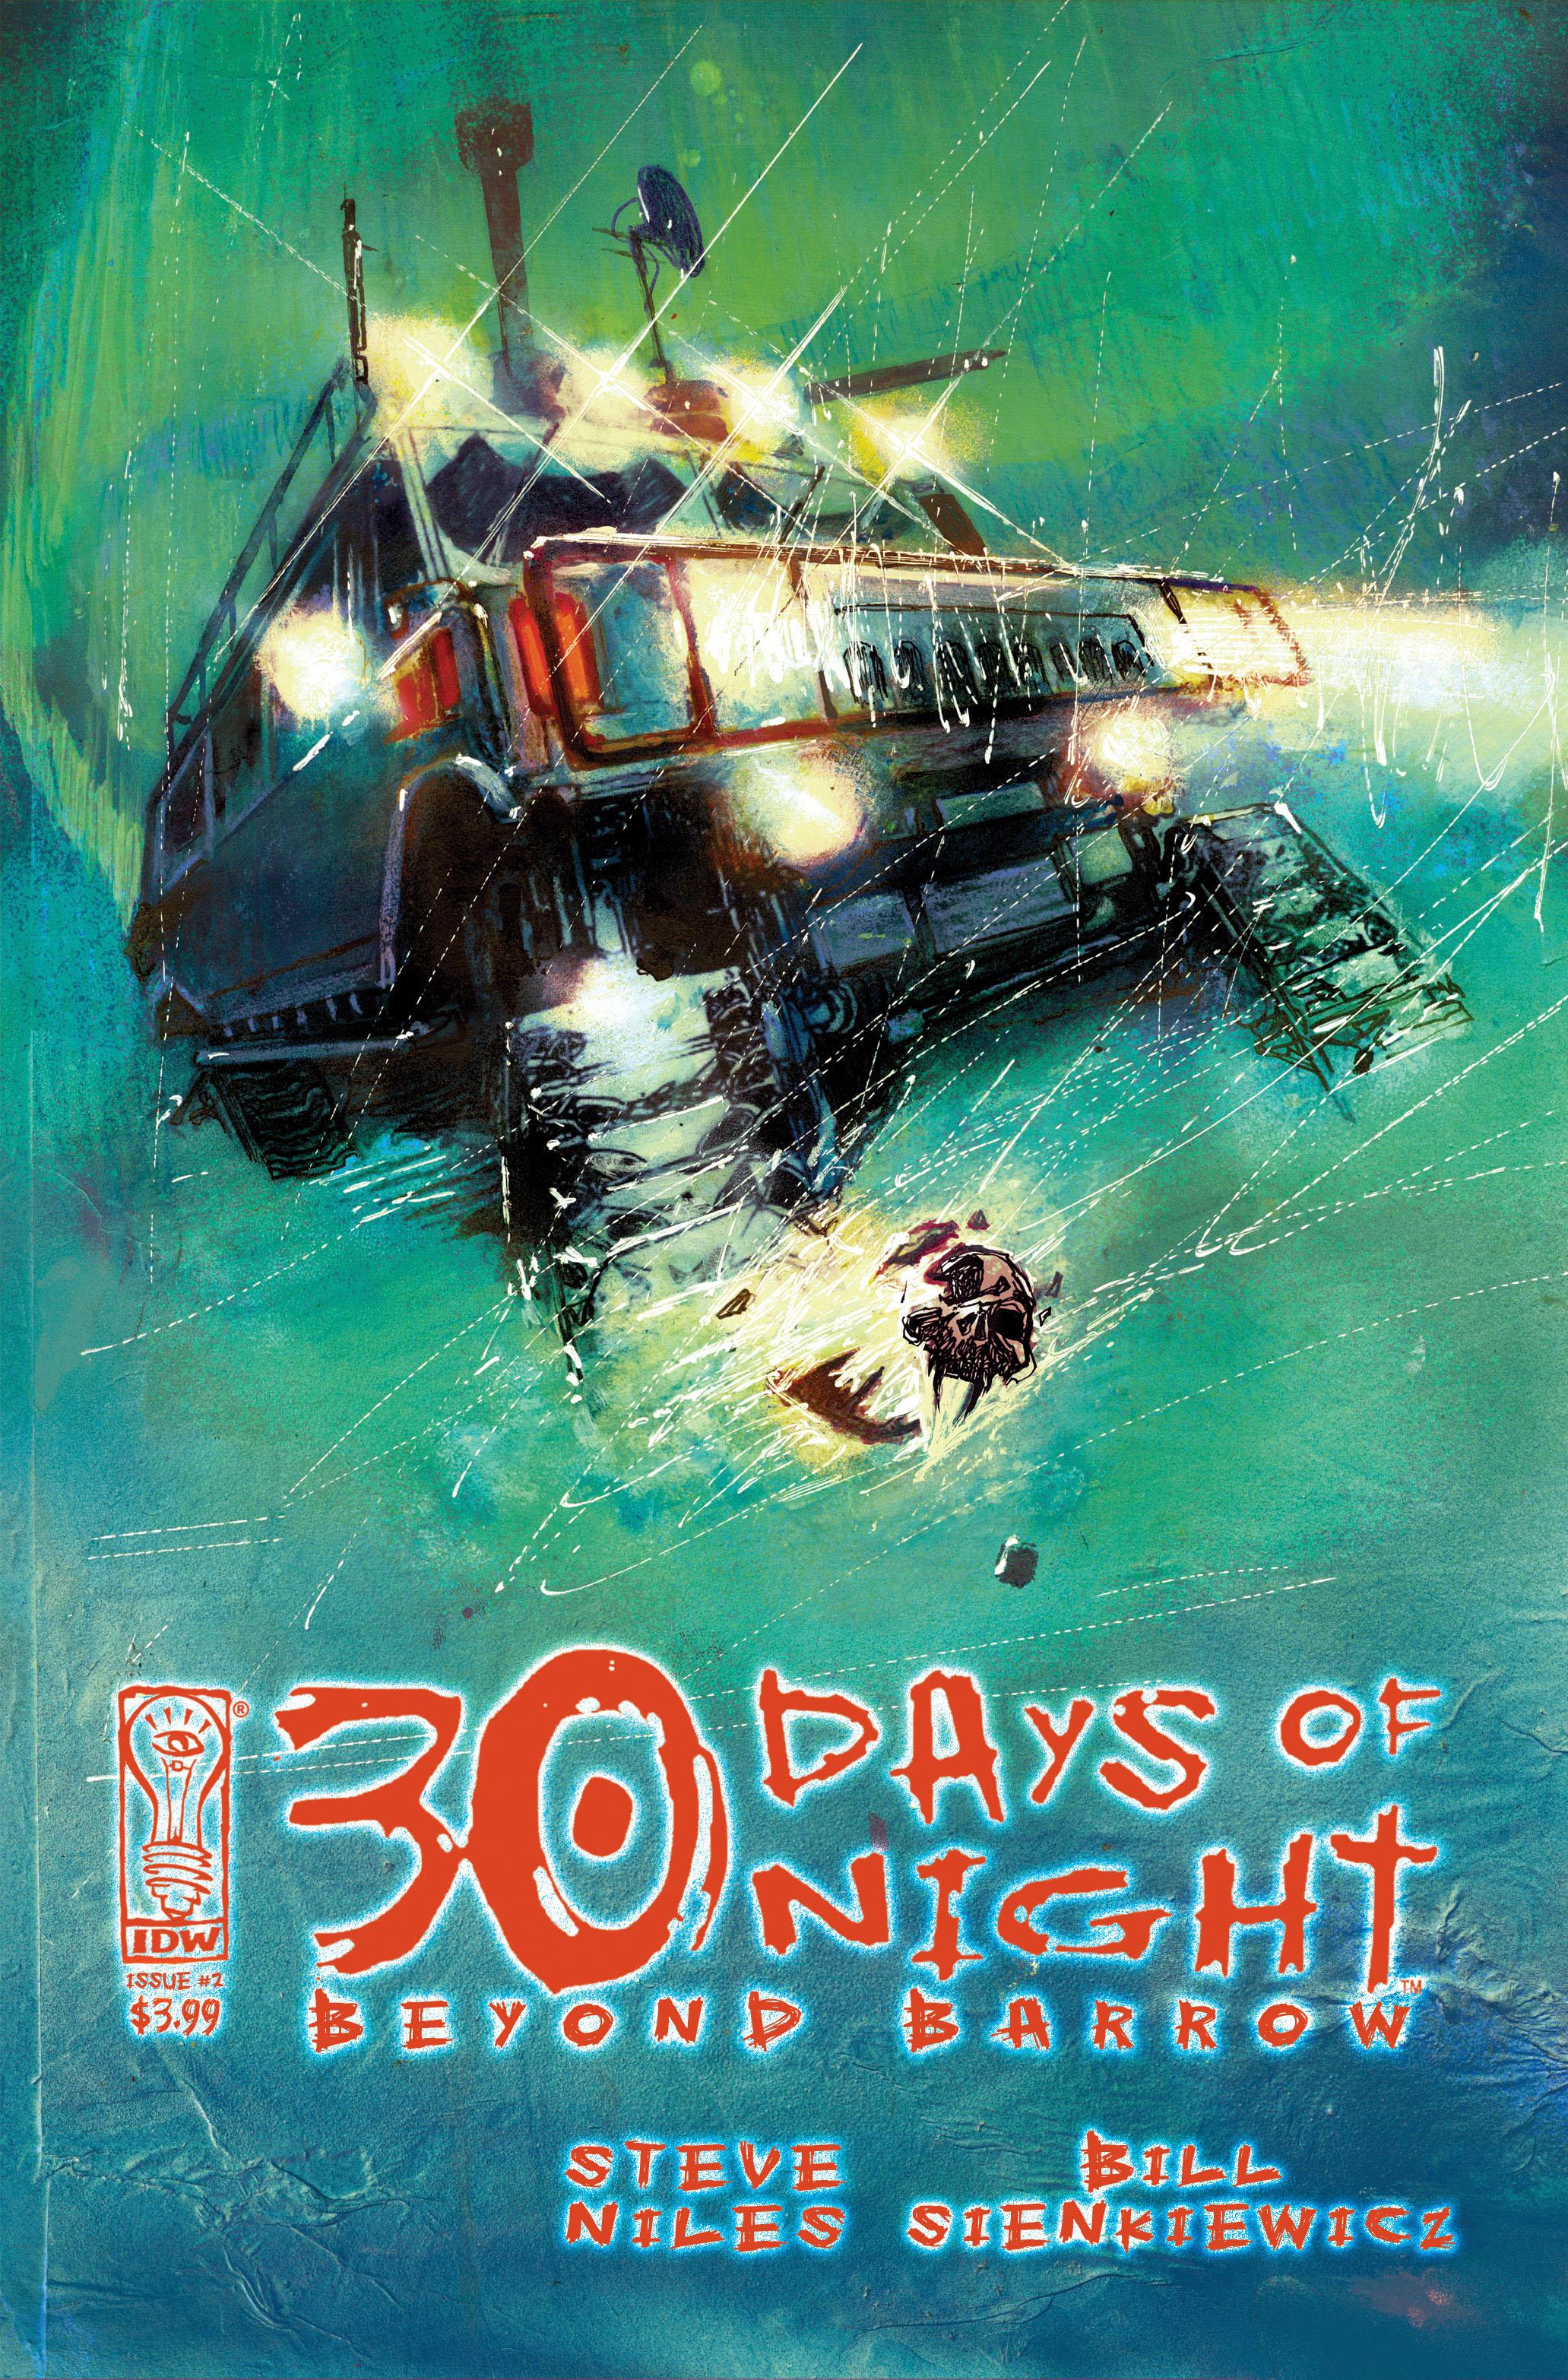 30 Days of Night: Beyond Barrow 2 Page 1